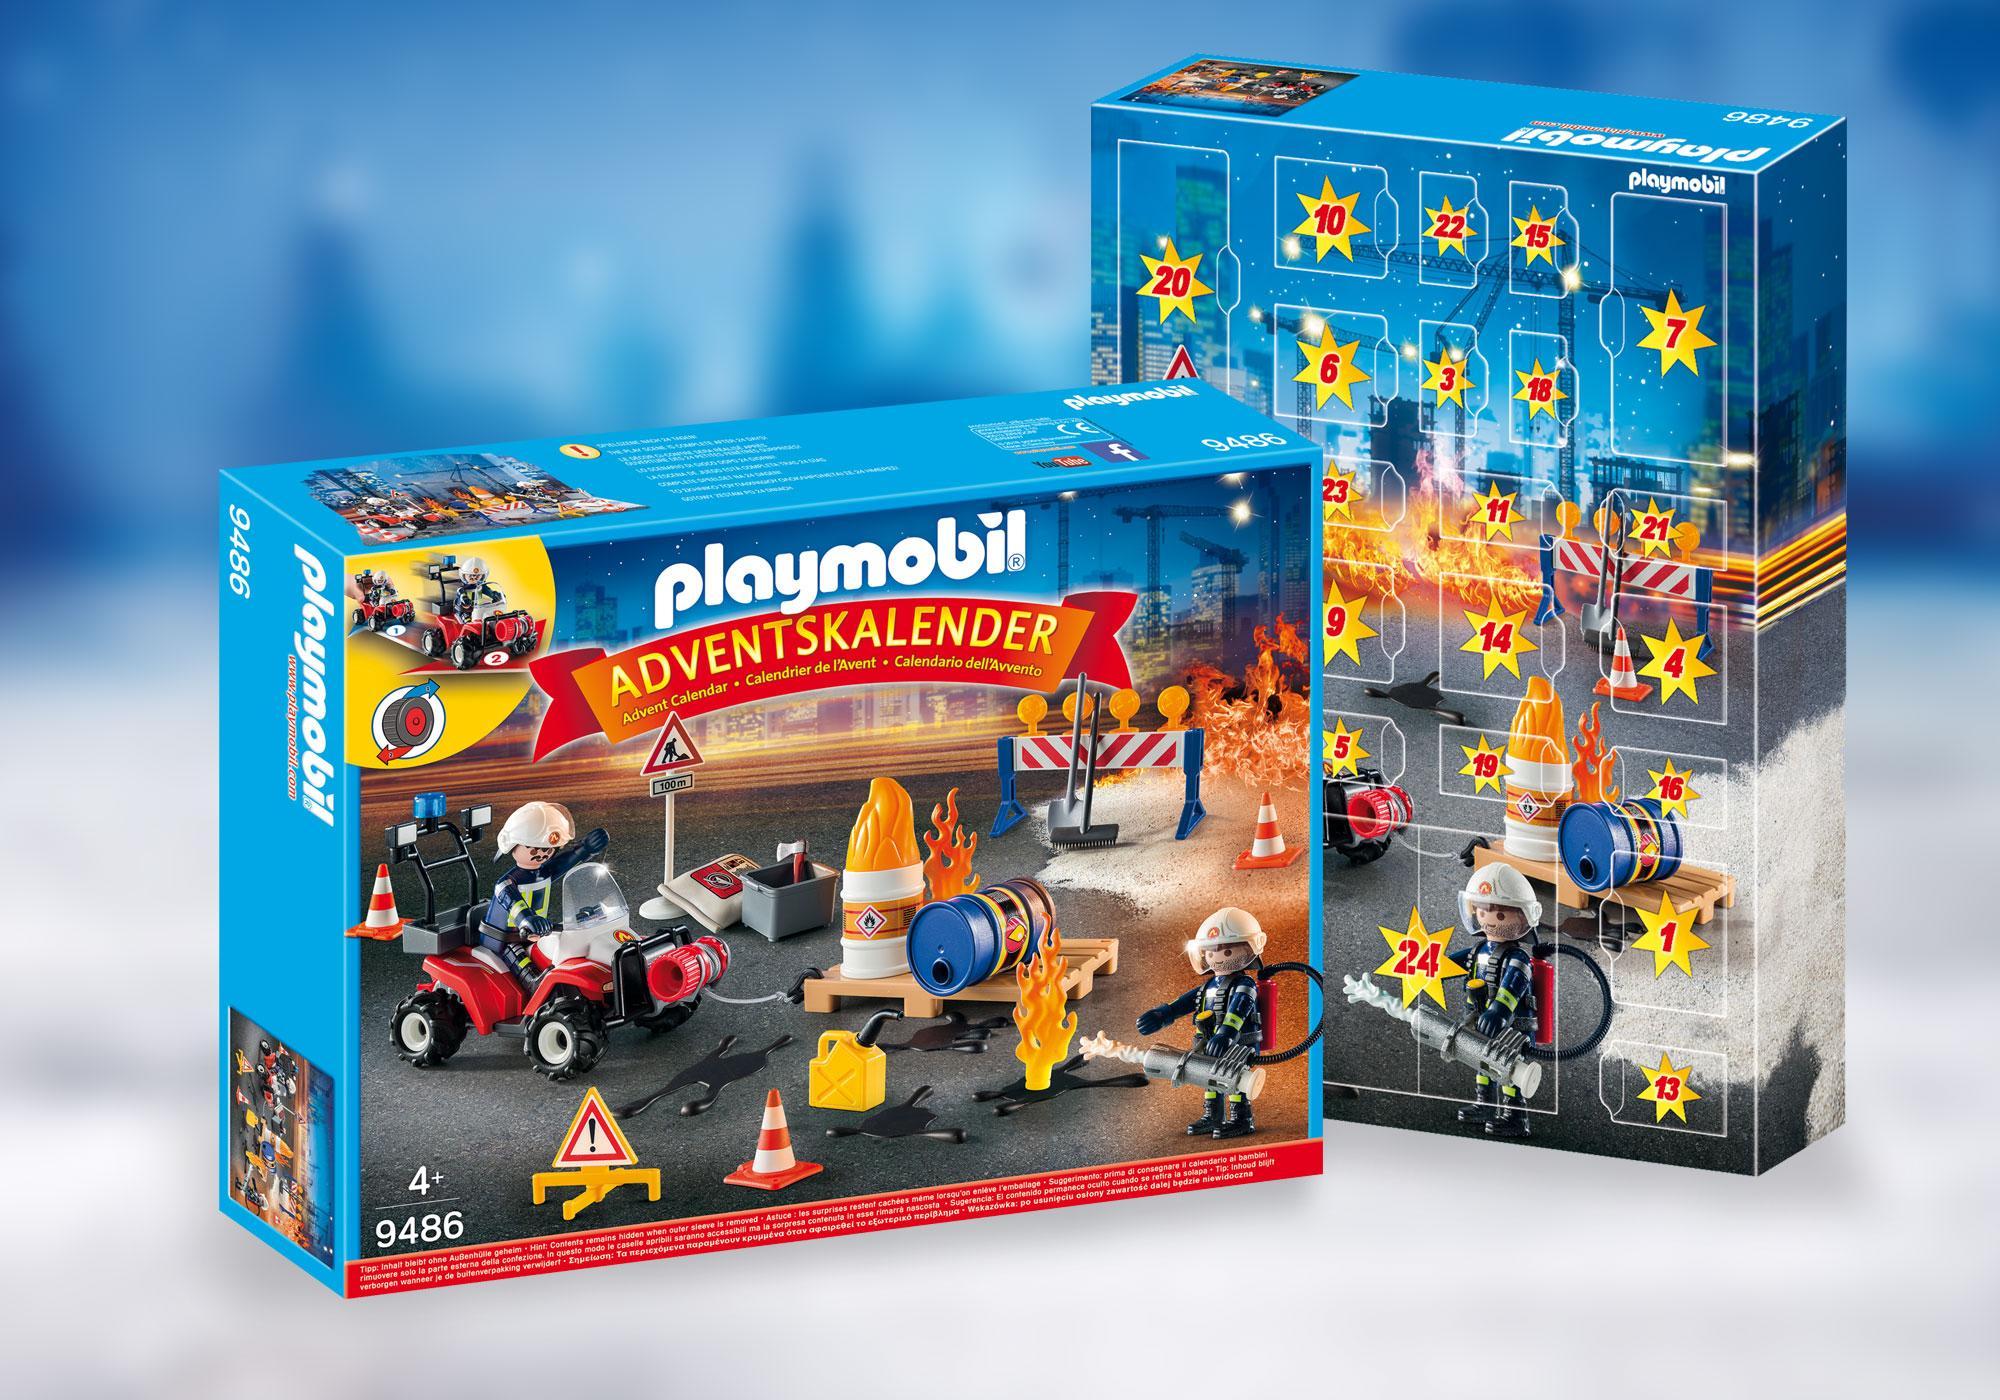 http://media.playmobil.com/i/playmobil/9486_product_detail/Adventskalender 'Interventie op de bouwwerf'